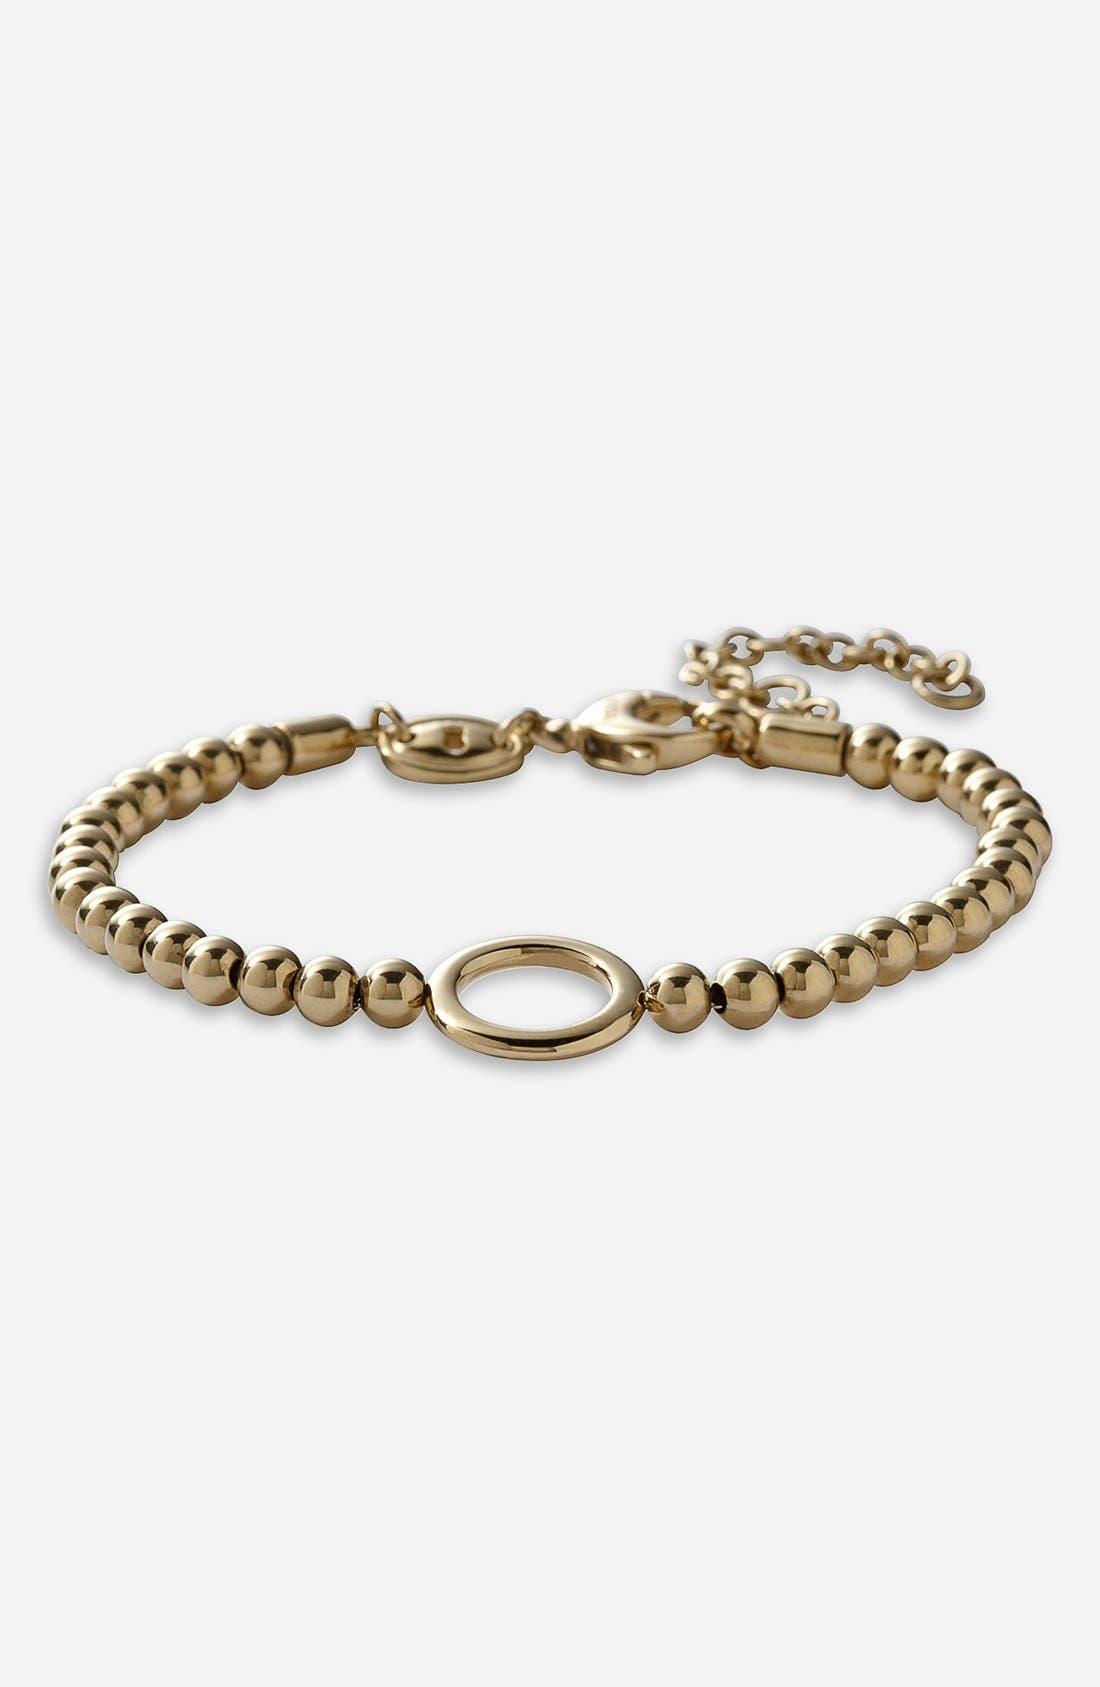 Main Image - Fossil Bead Charm Bracelet